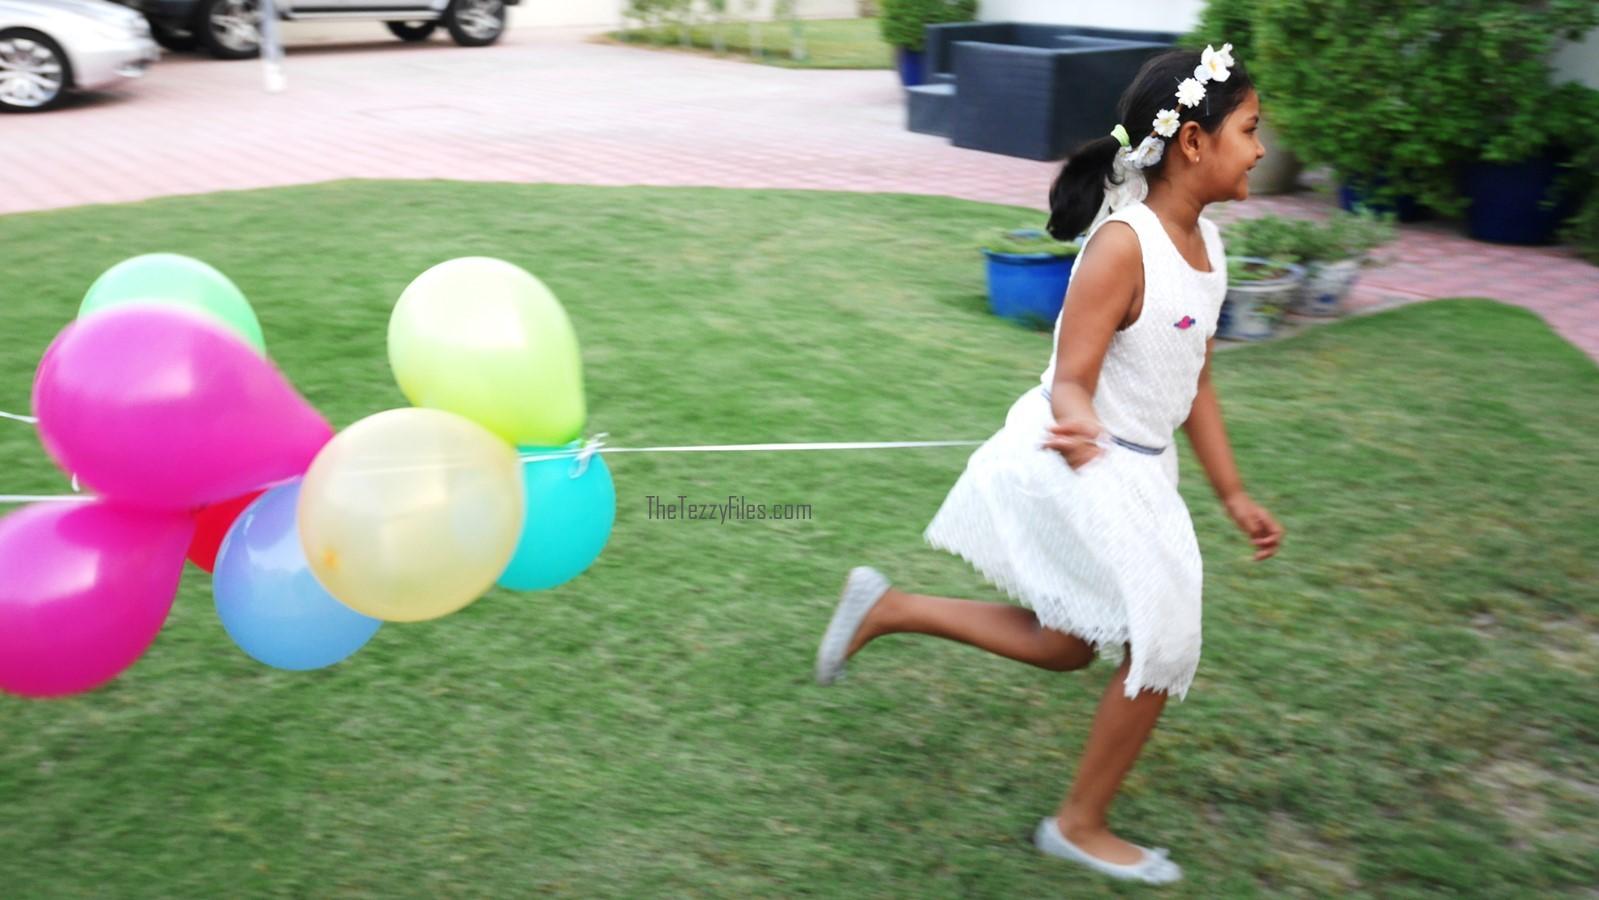 Balloonee Brothers Gas Helium Balloon Kit DIY Party Birthday Child Blogger UAE Dubai The Tezzy Files (8)